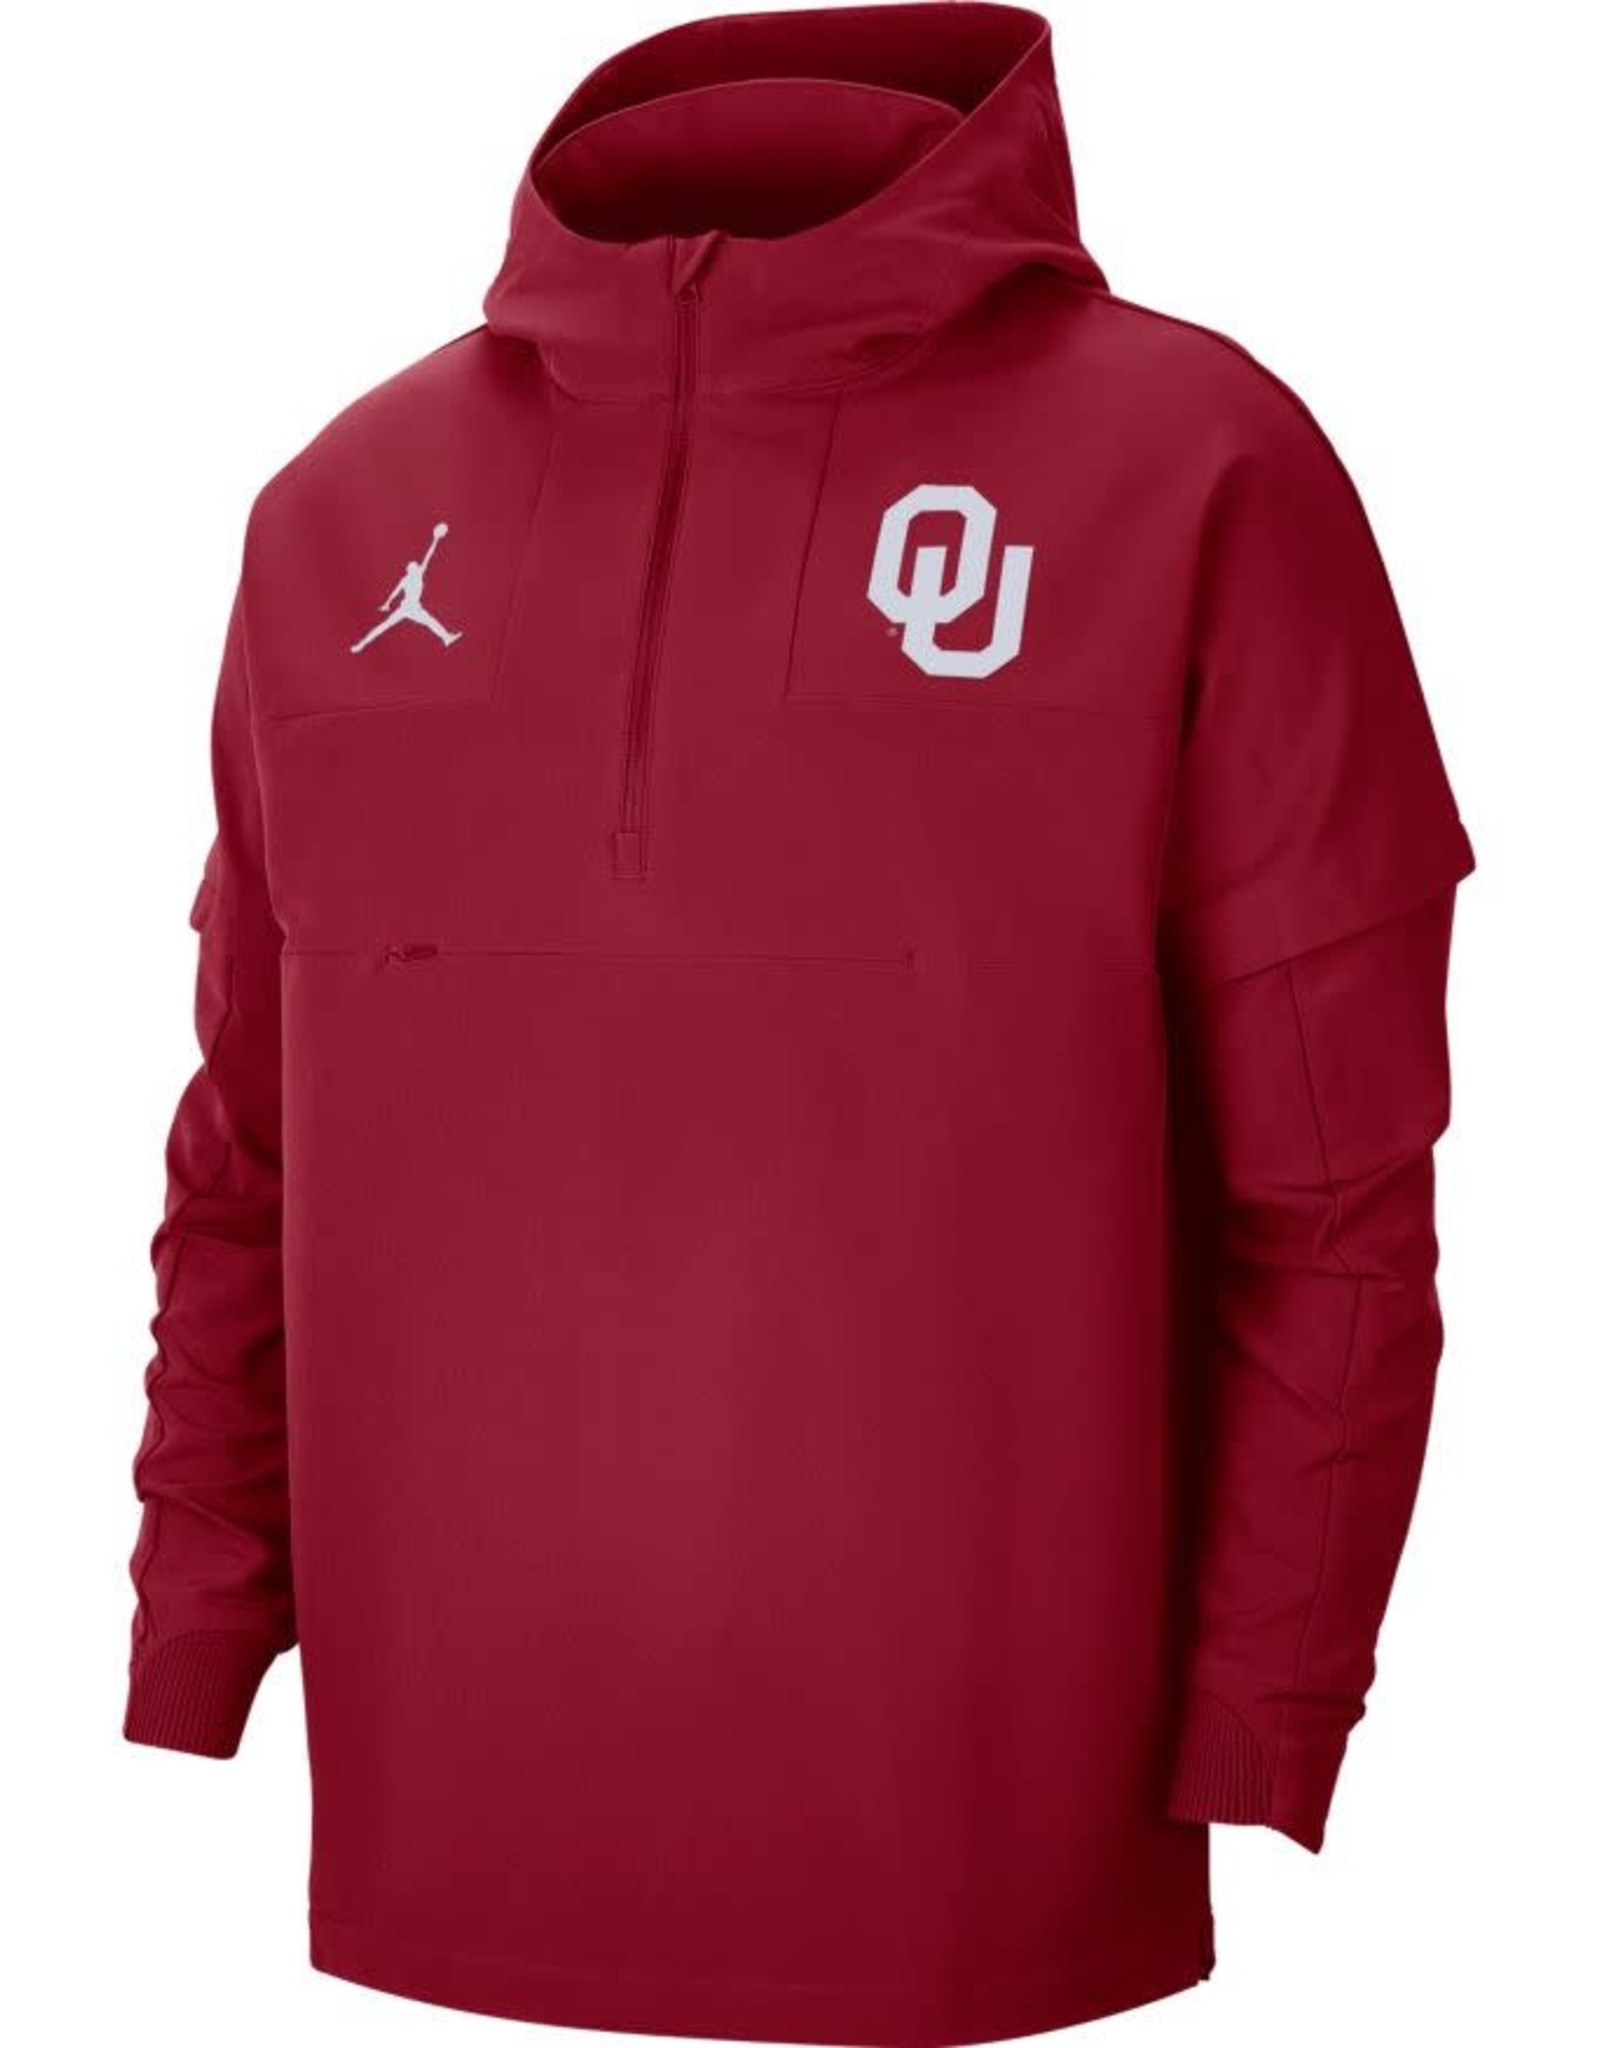 Jordan Men's Jordan OU Crimson Pregame 1/2 Zip Jacket